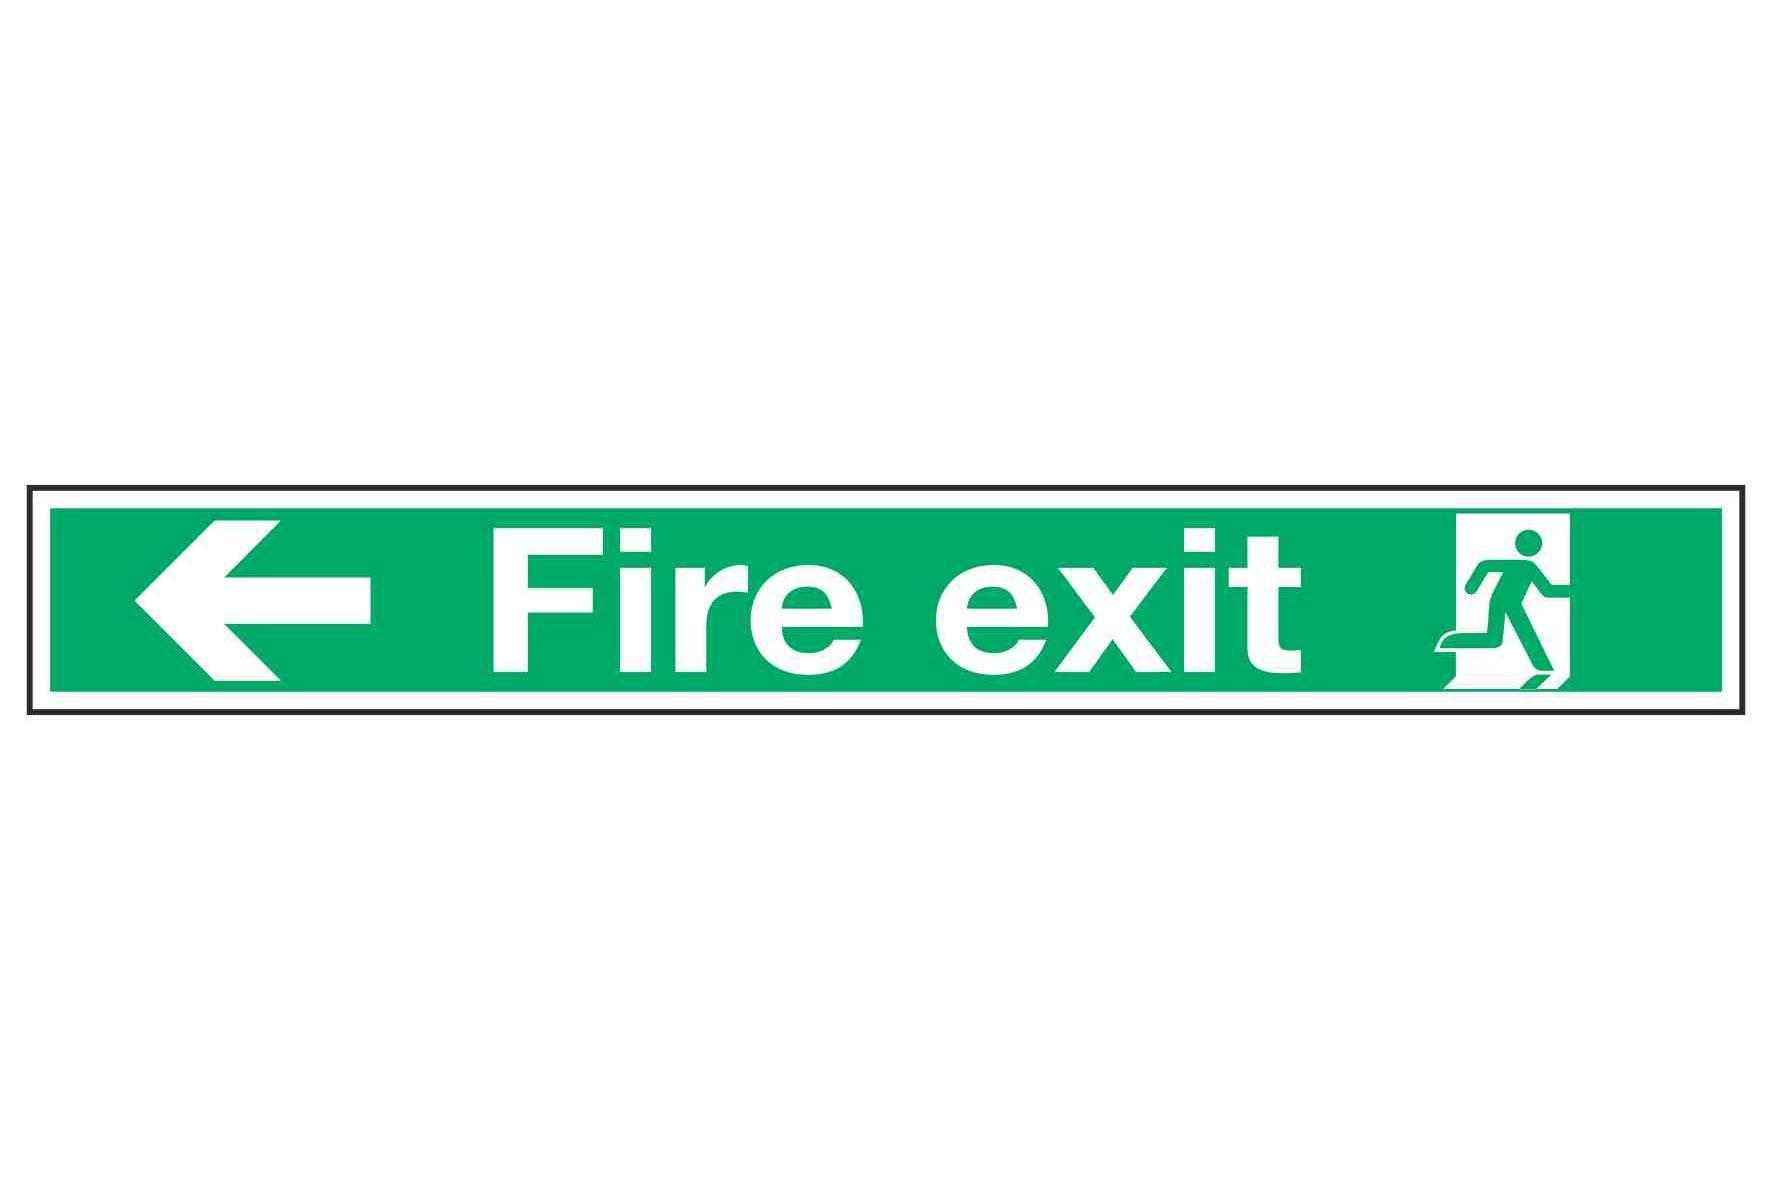 Fire exit / Arrow Left 750mm x 150mm